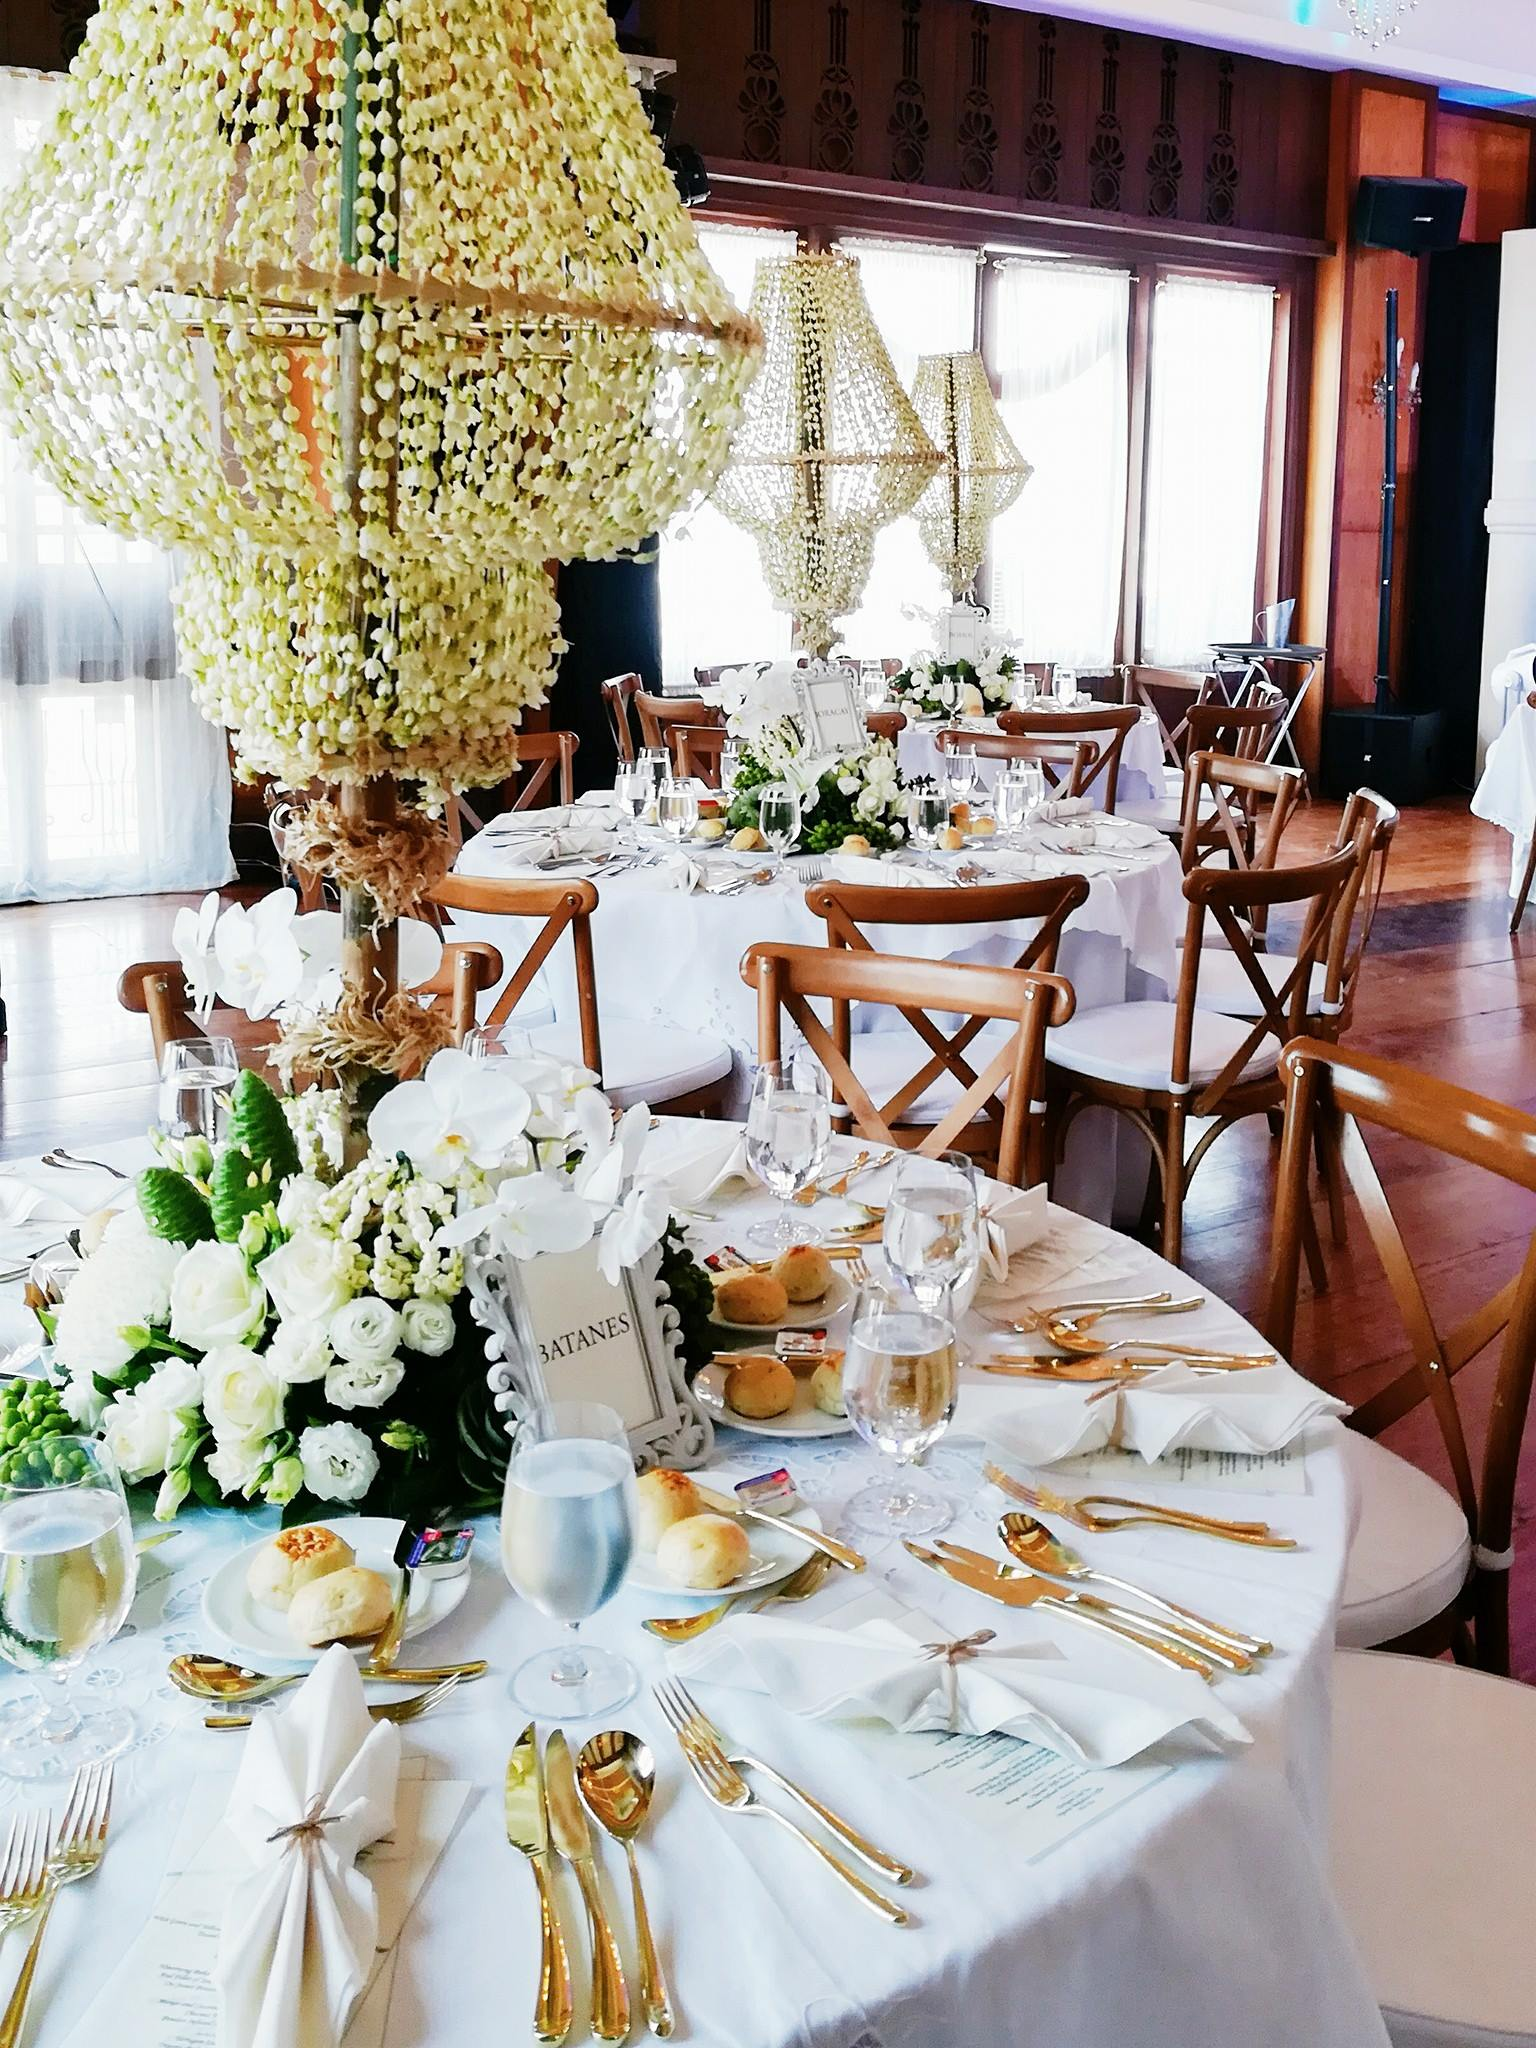 bizu catering studio white table setup